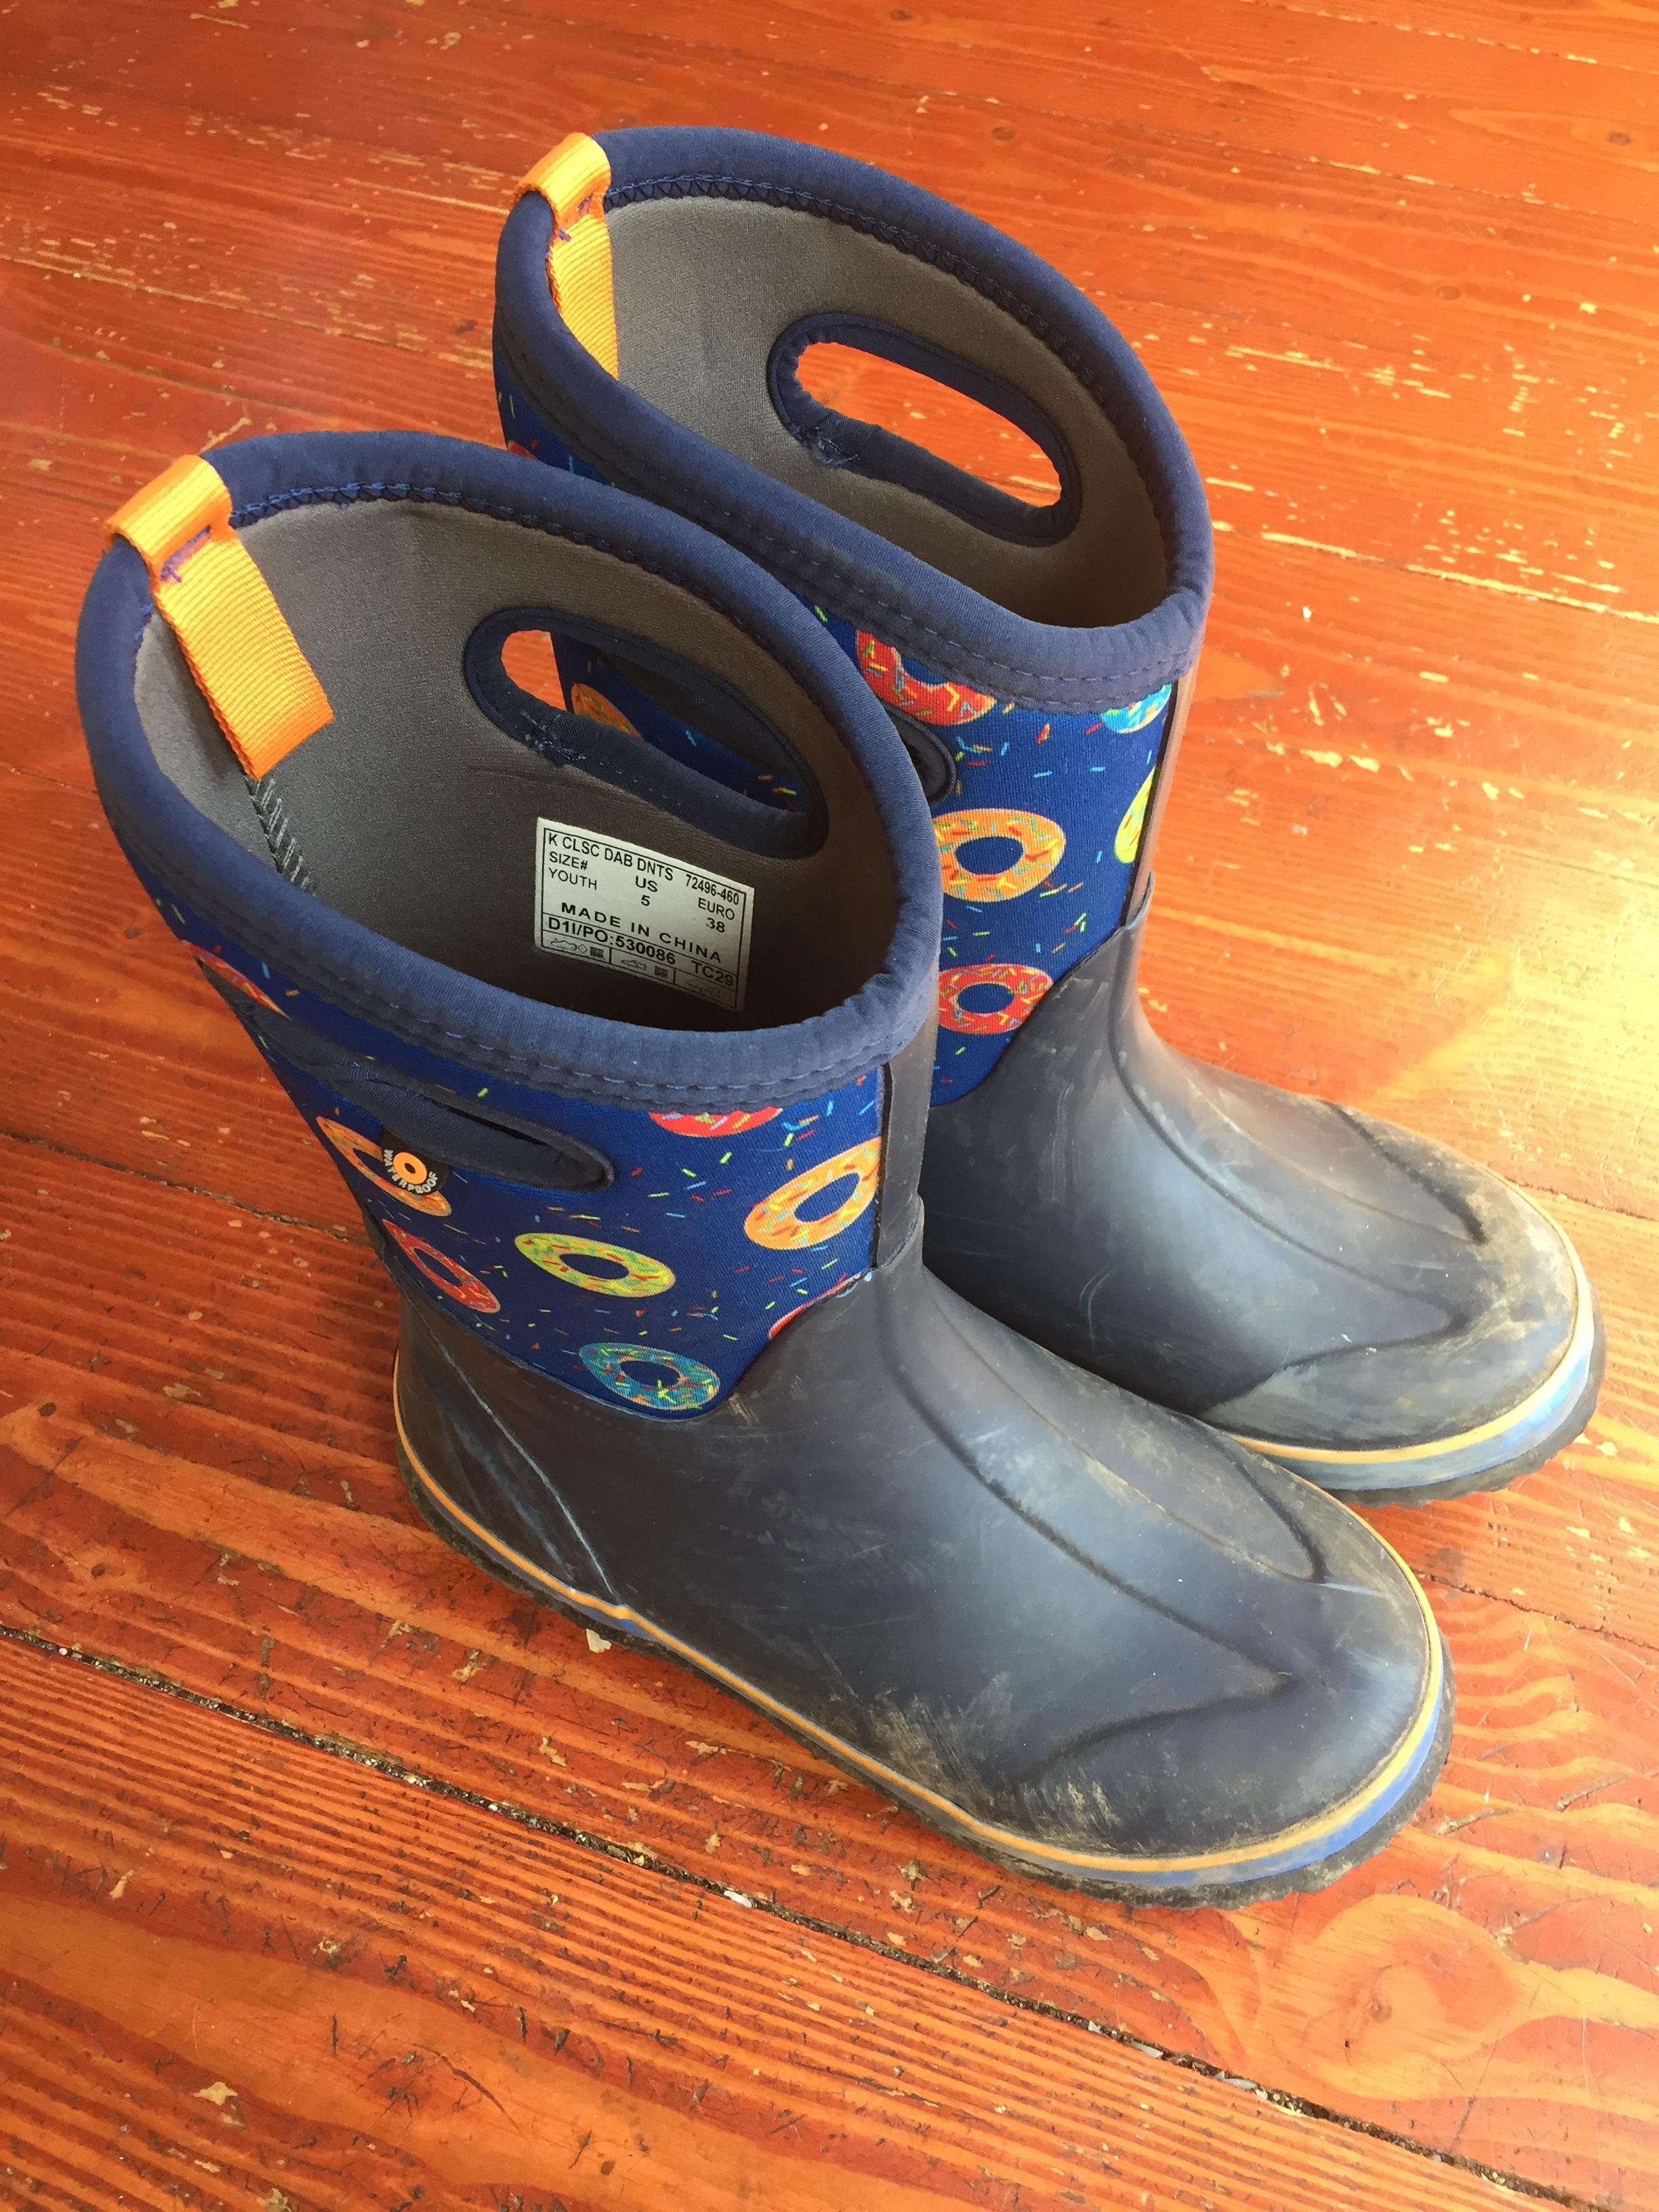 Bogs big kid insulated rain boots